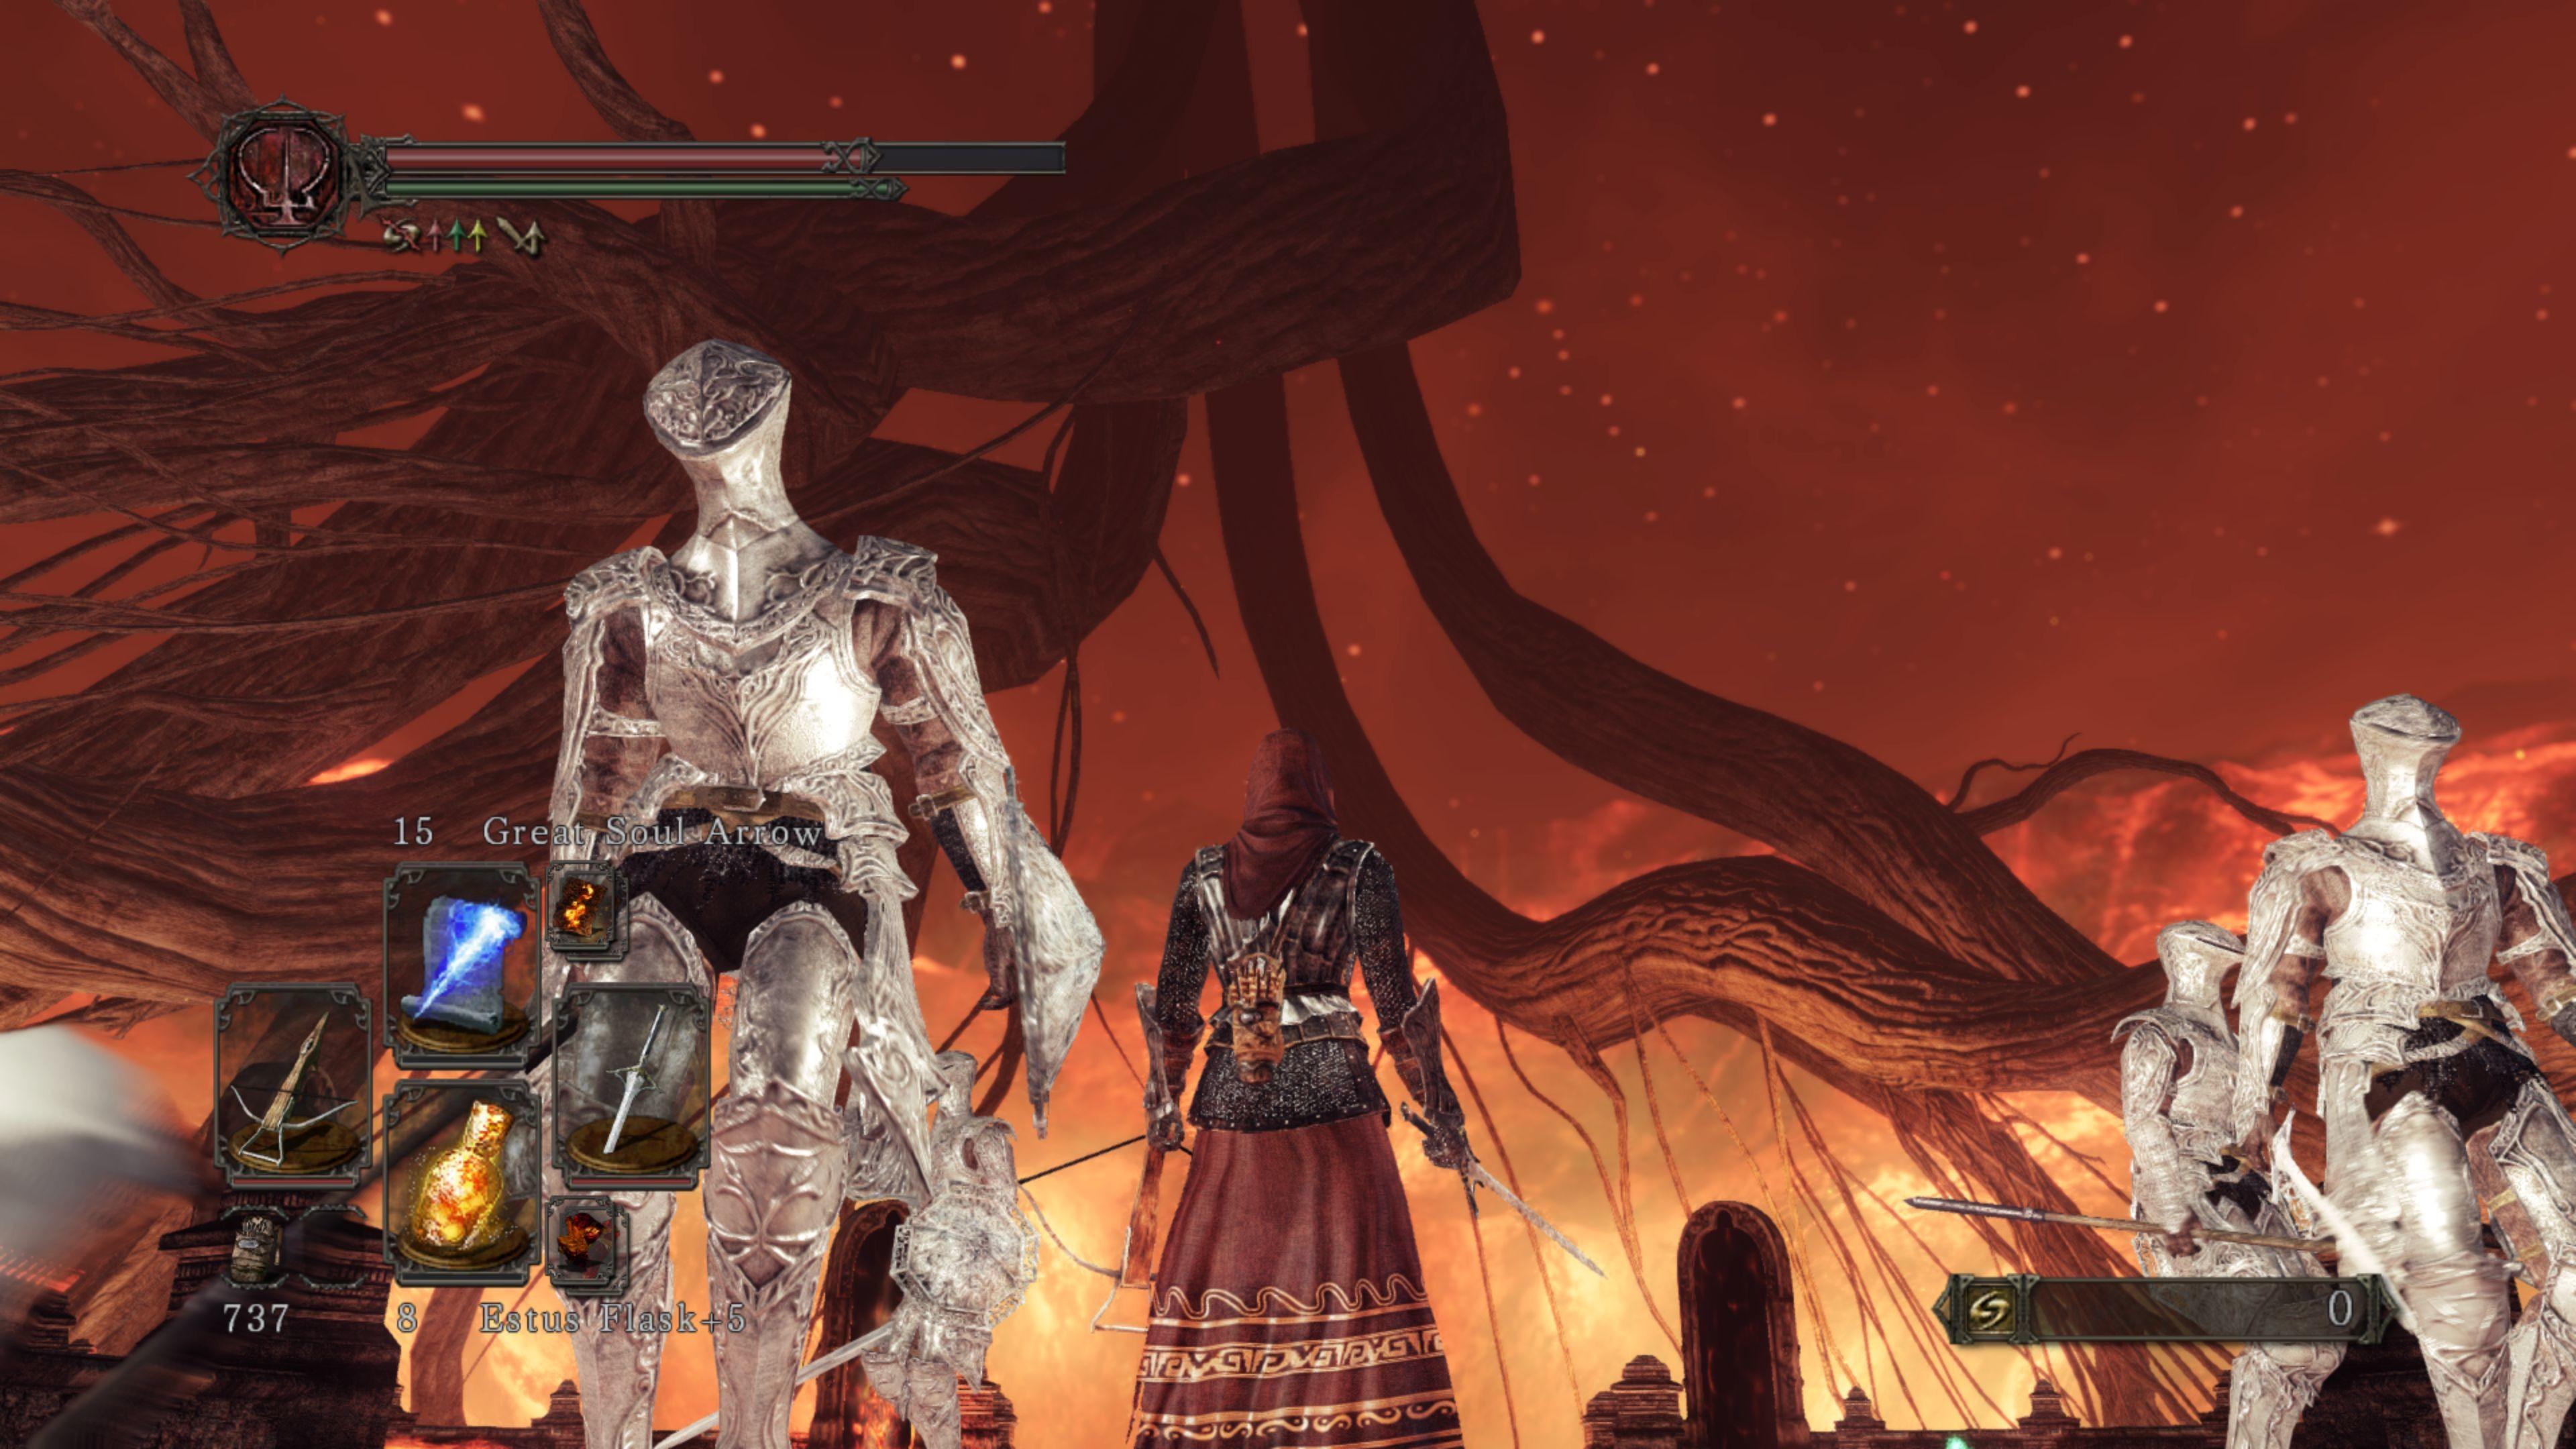 Gameplay Dark Souls 3 4k Wallpapers Abyss Watchers 4 K 3840x2160 Download Hd Wallpaper Wallpapertip